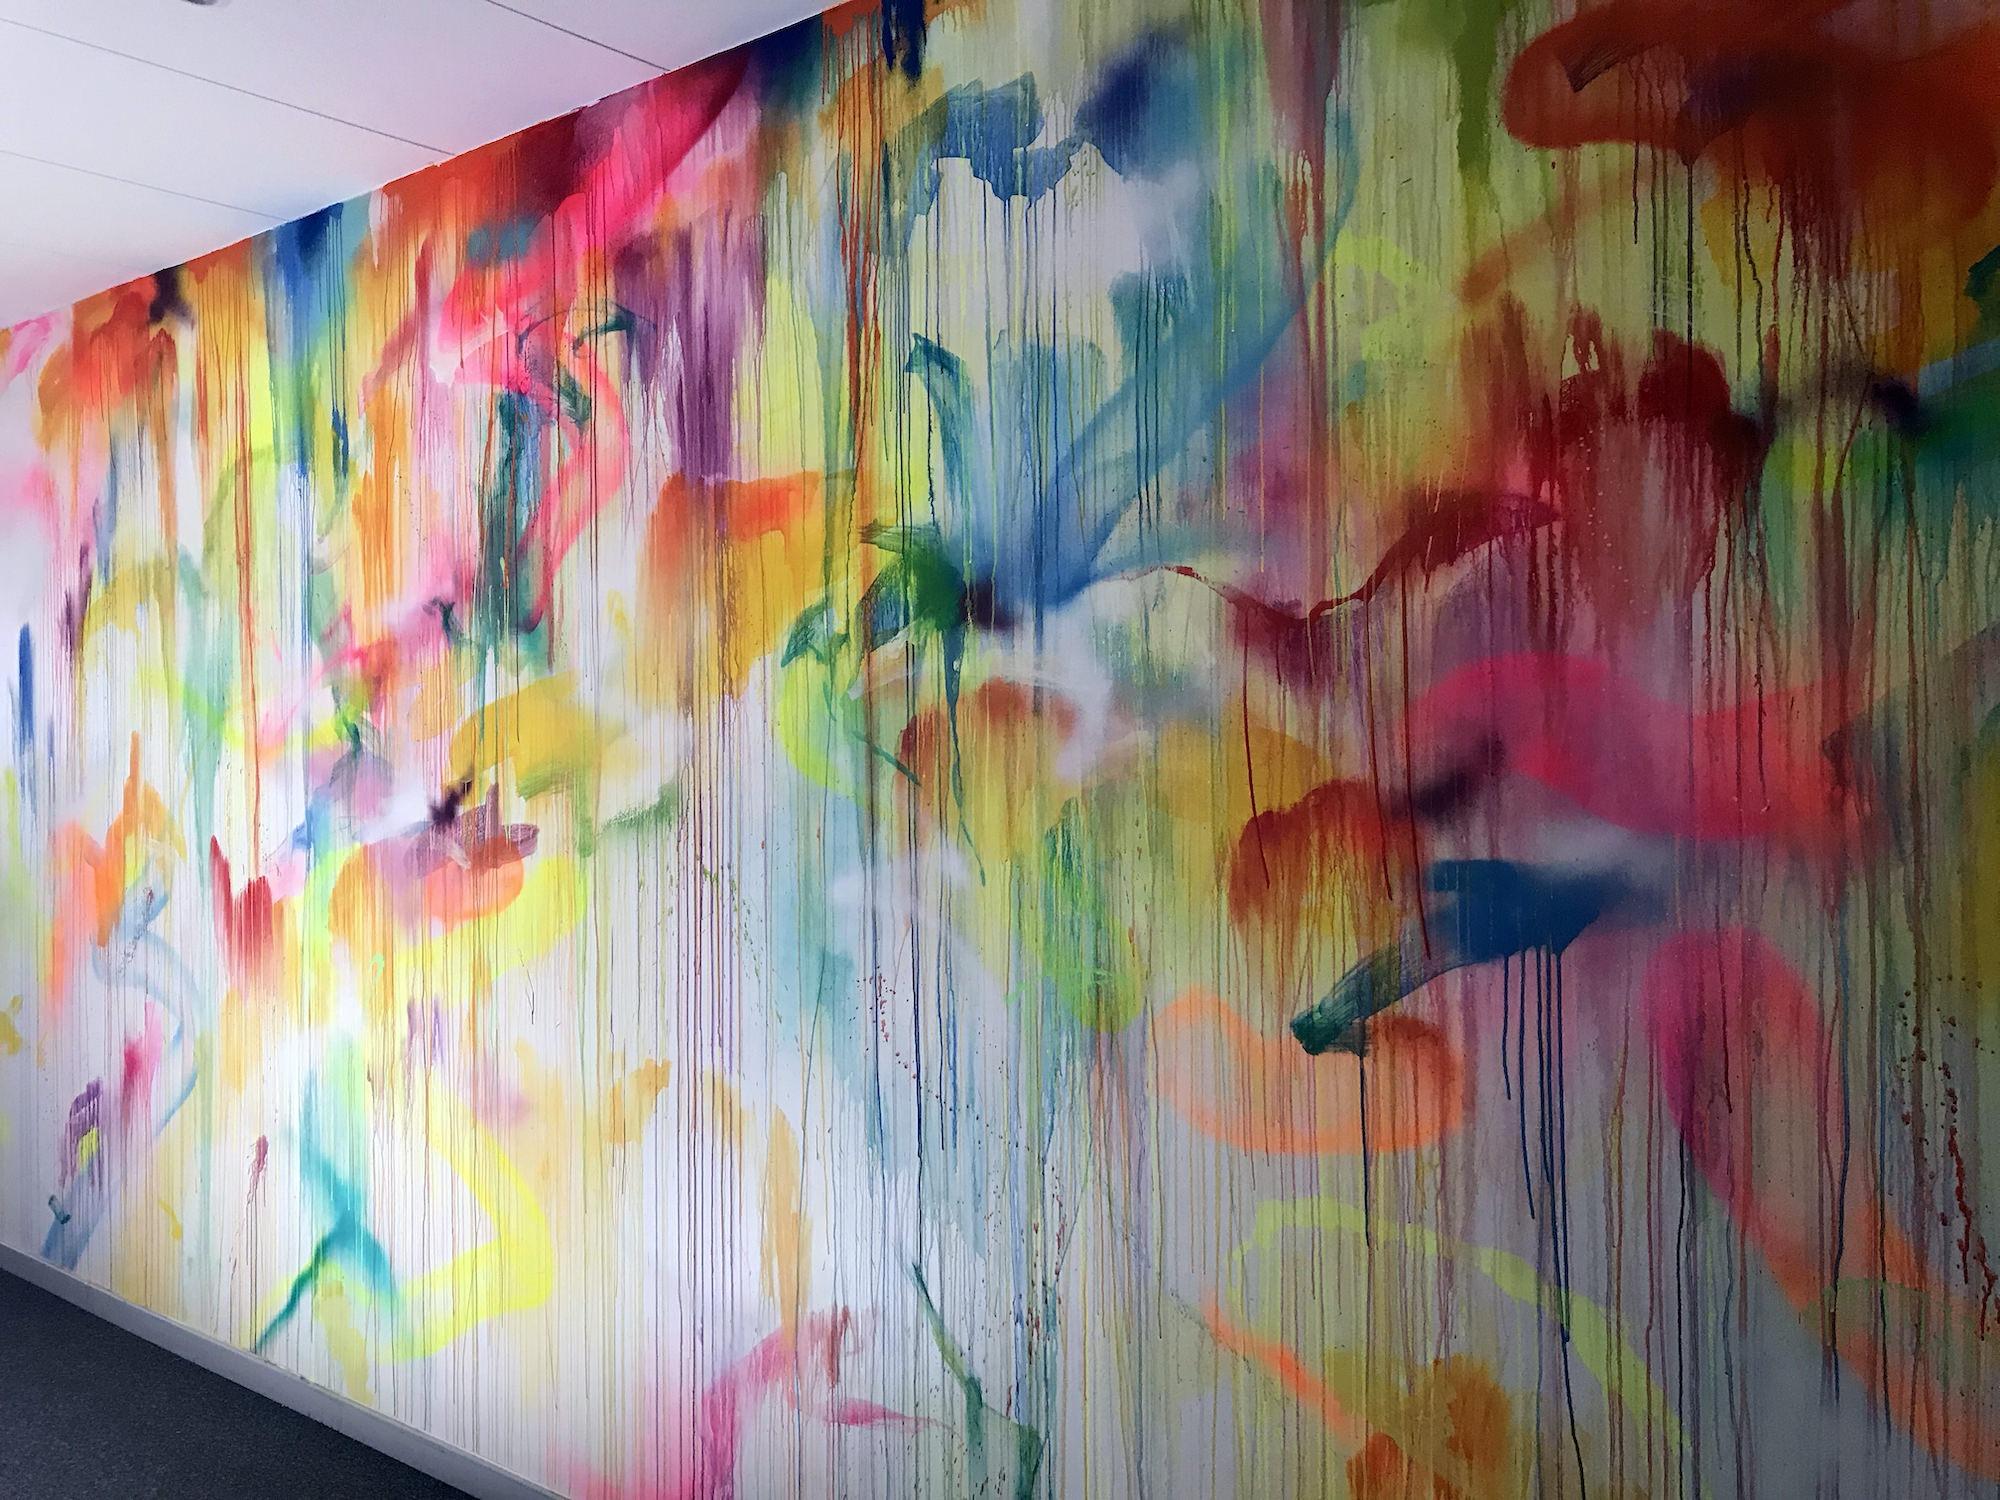 mur-couleurs-graffiti-drips-bureaux-fresque